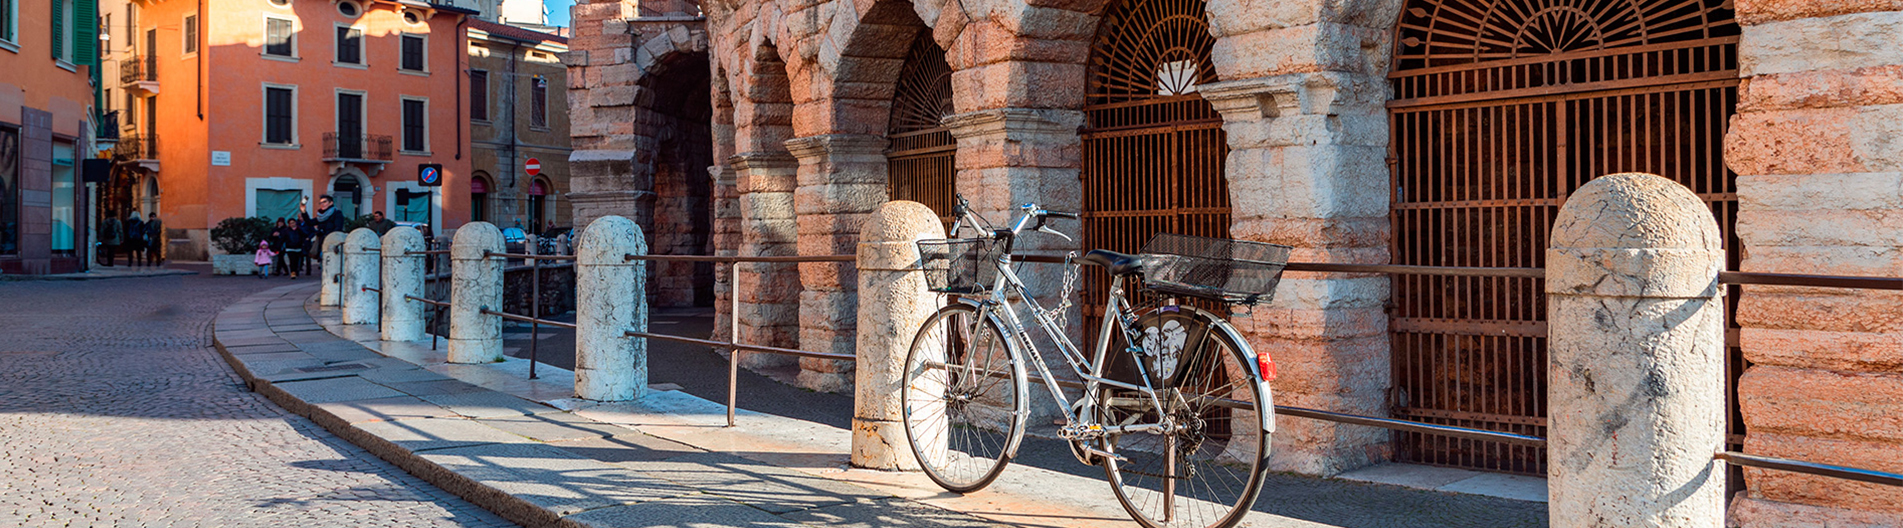 Discover Verona by Bike!